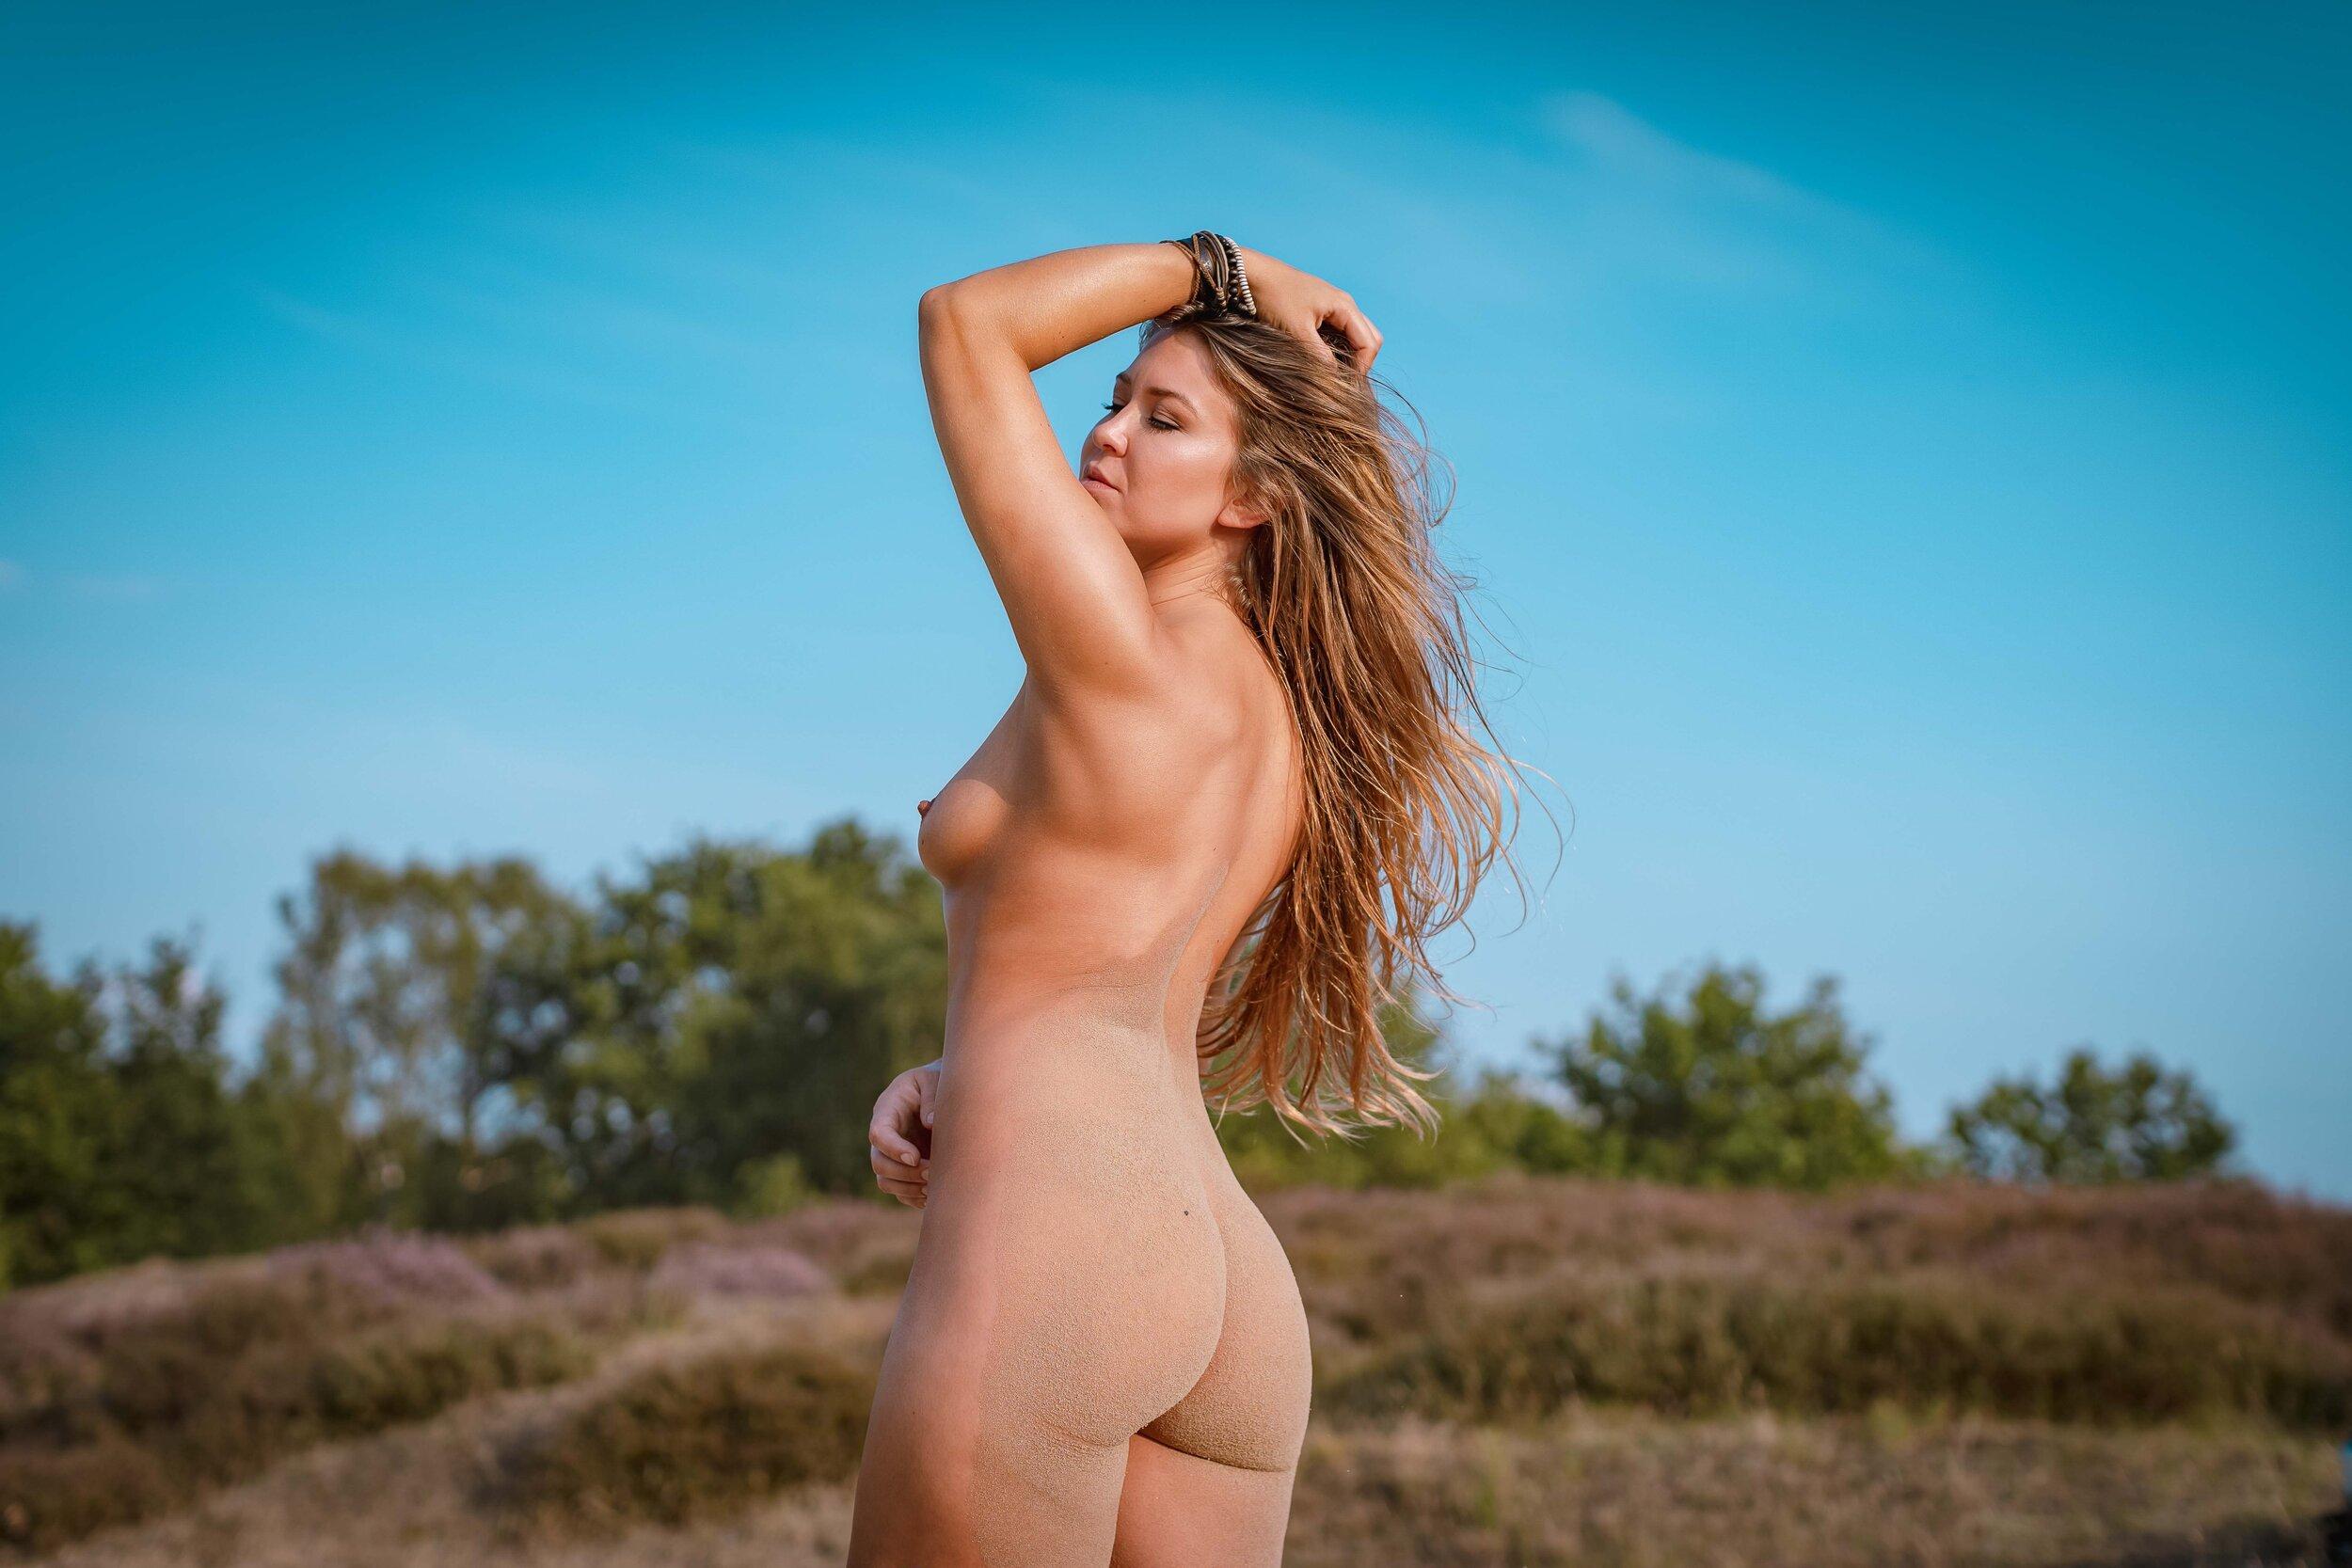 Steffi - Gildo Cassimo photoshoot